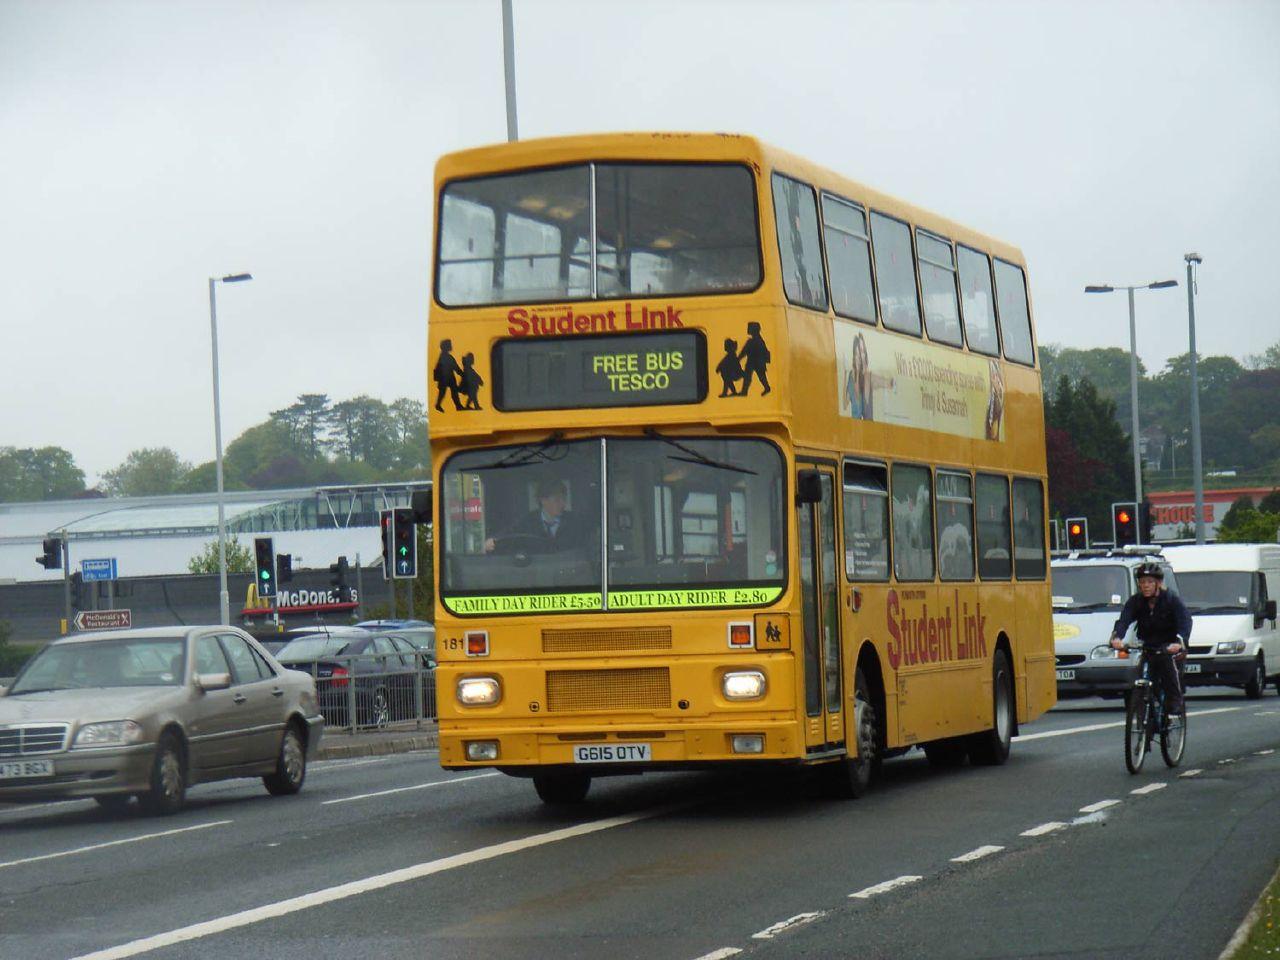 Plymouth Citybus 181 G615OTV